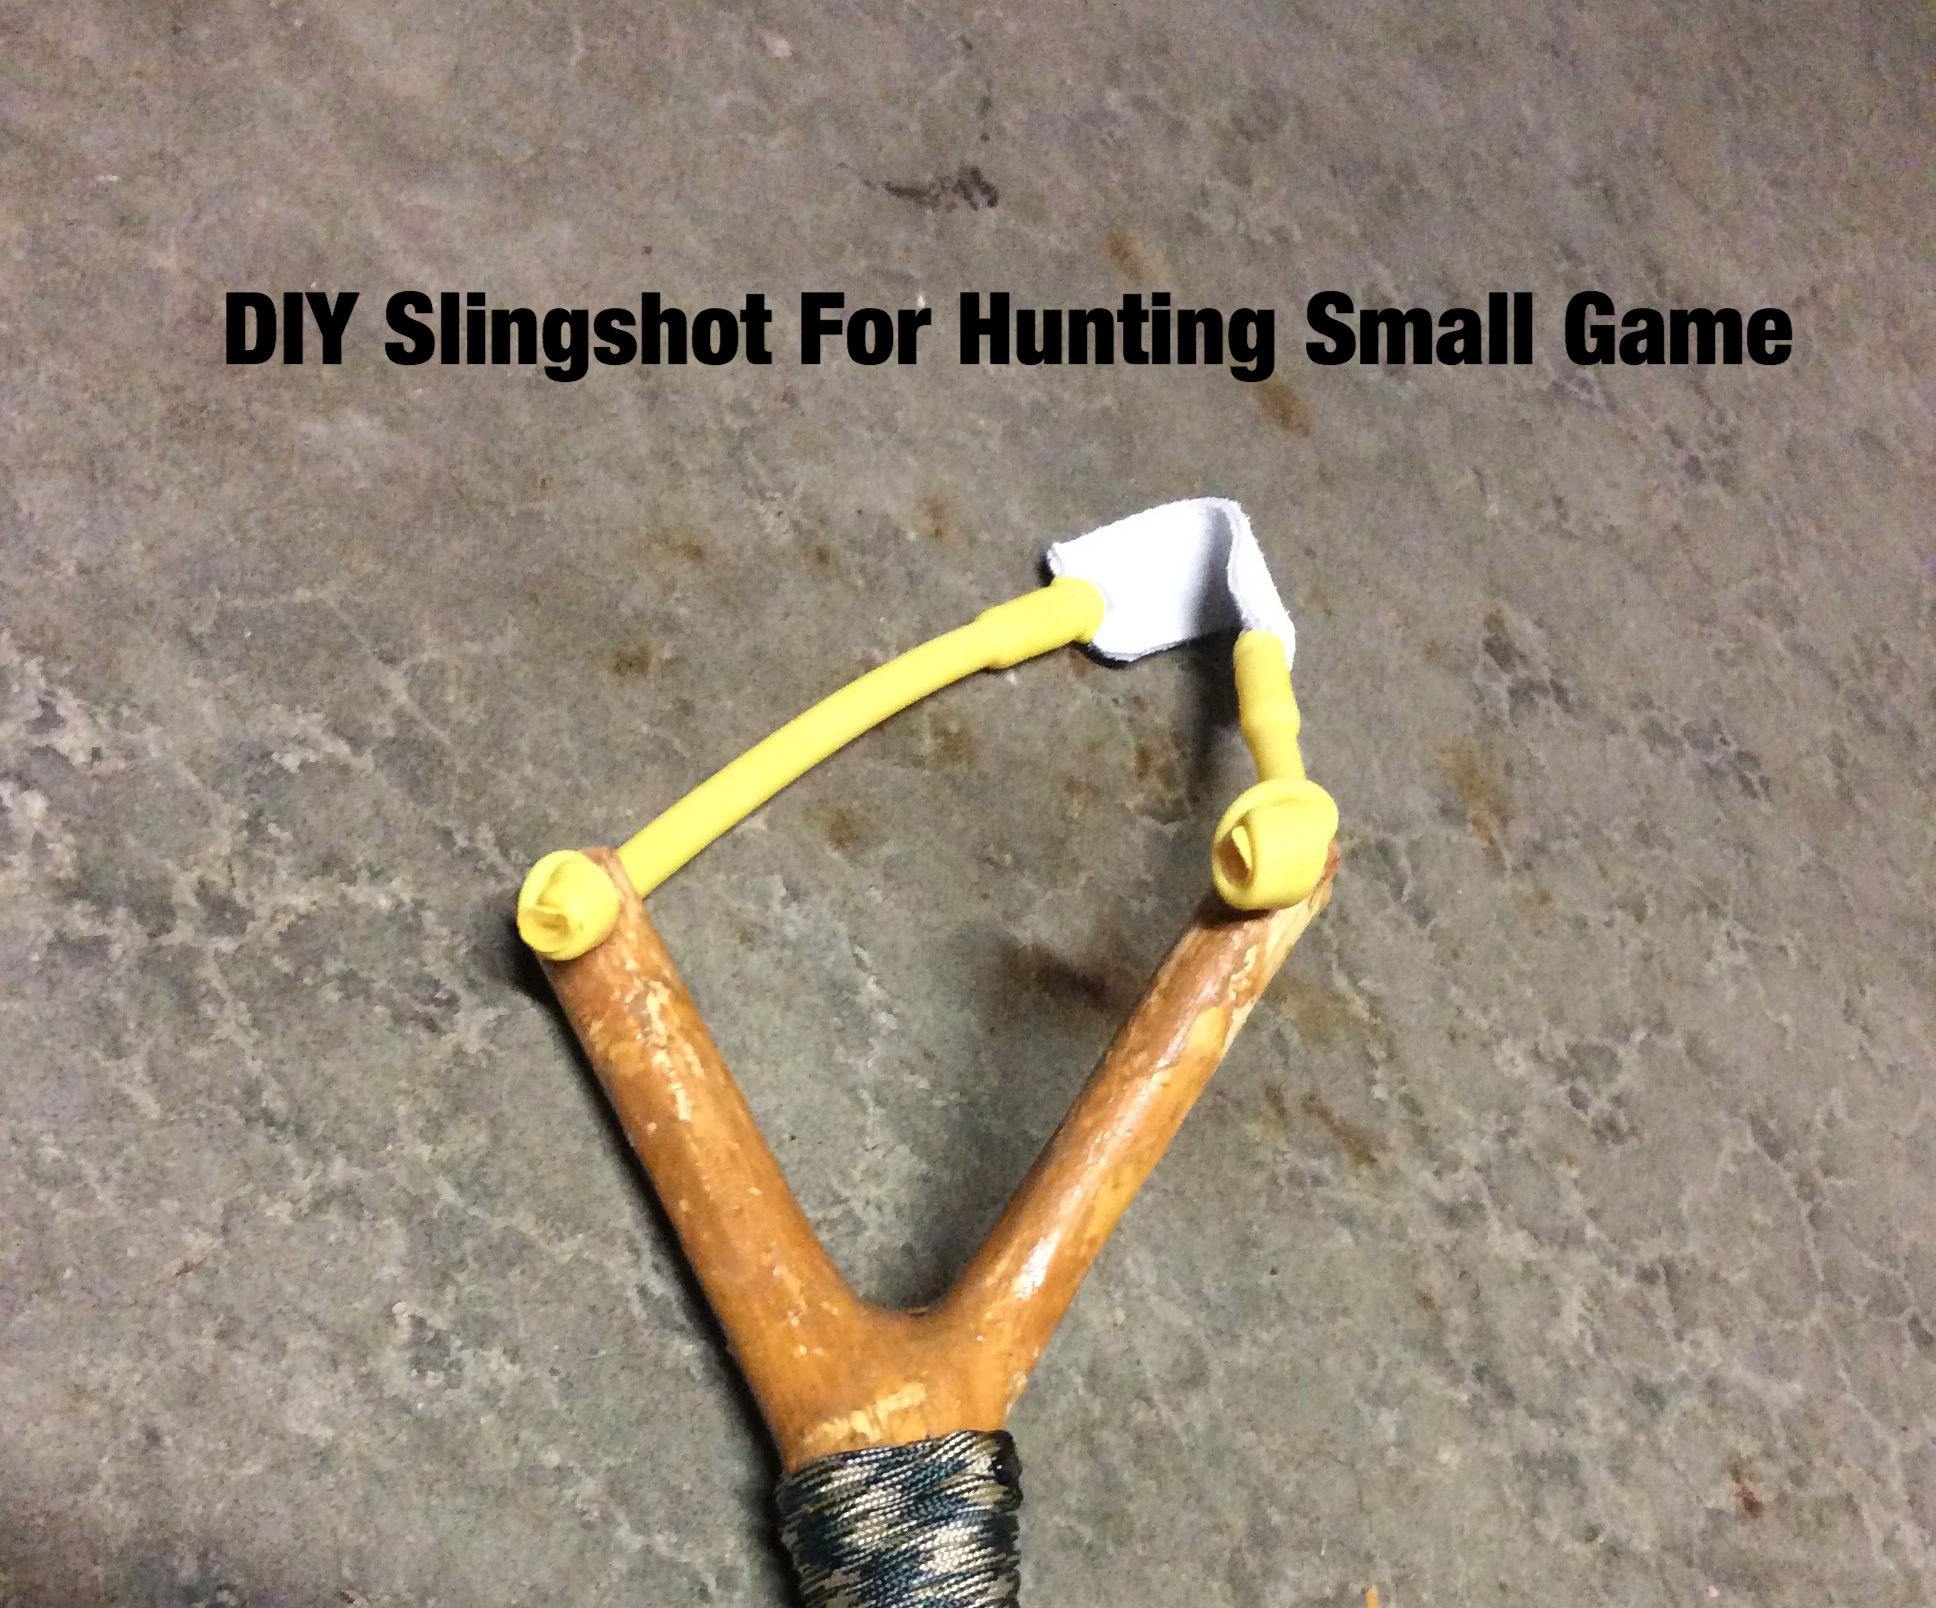 DIY Slingshot For Hunting Small Game !!!